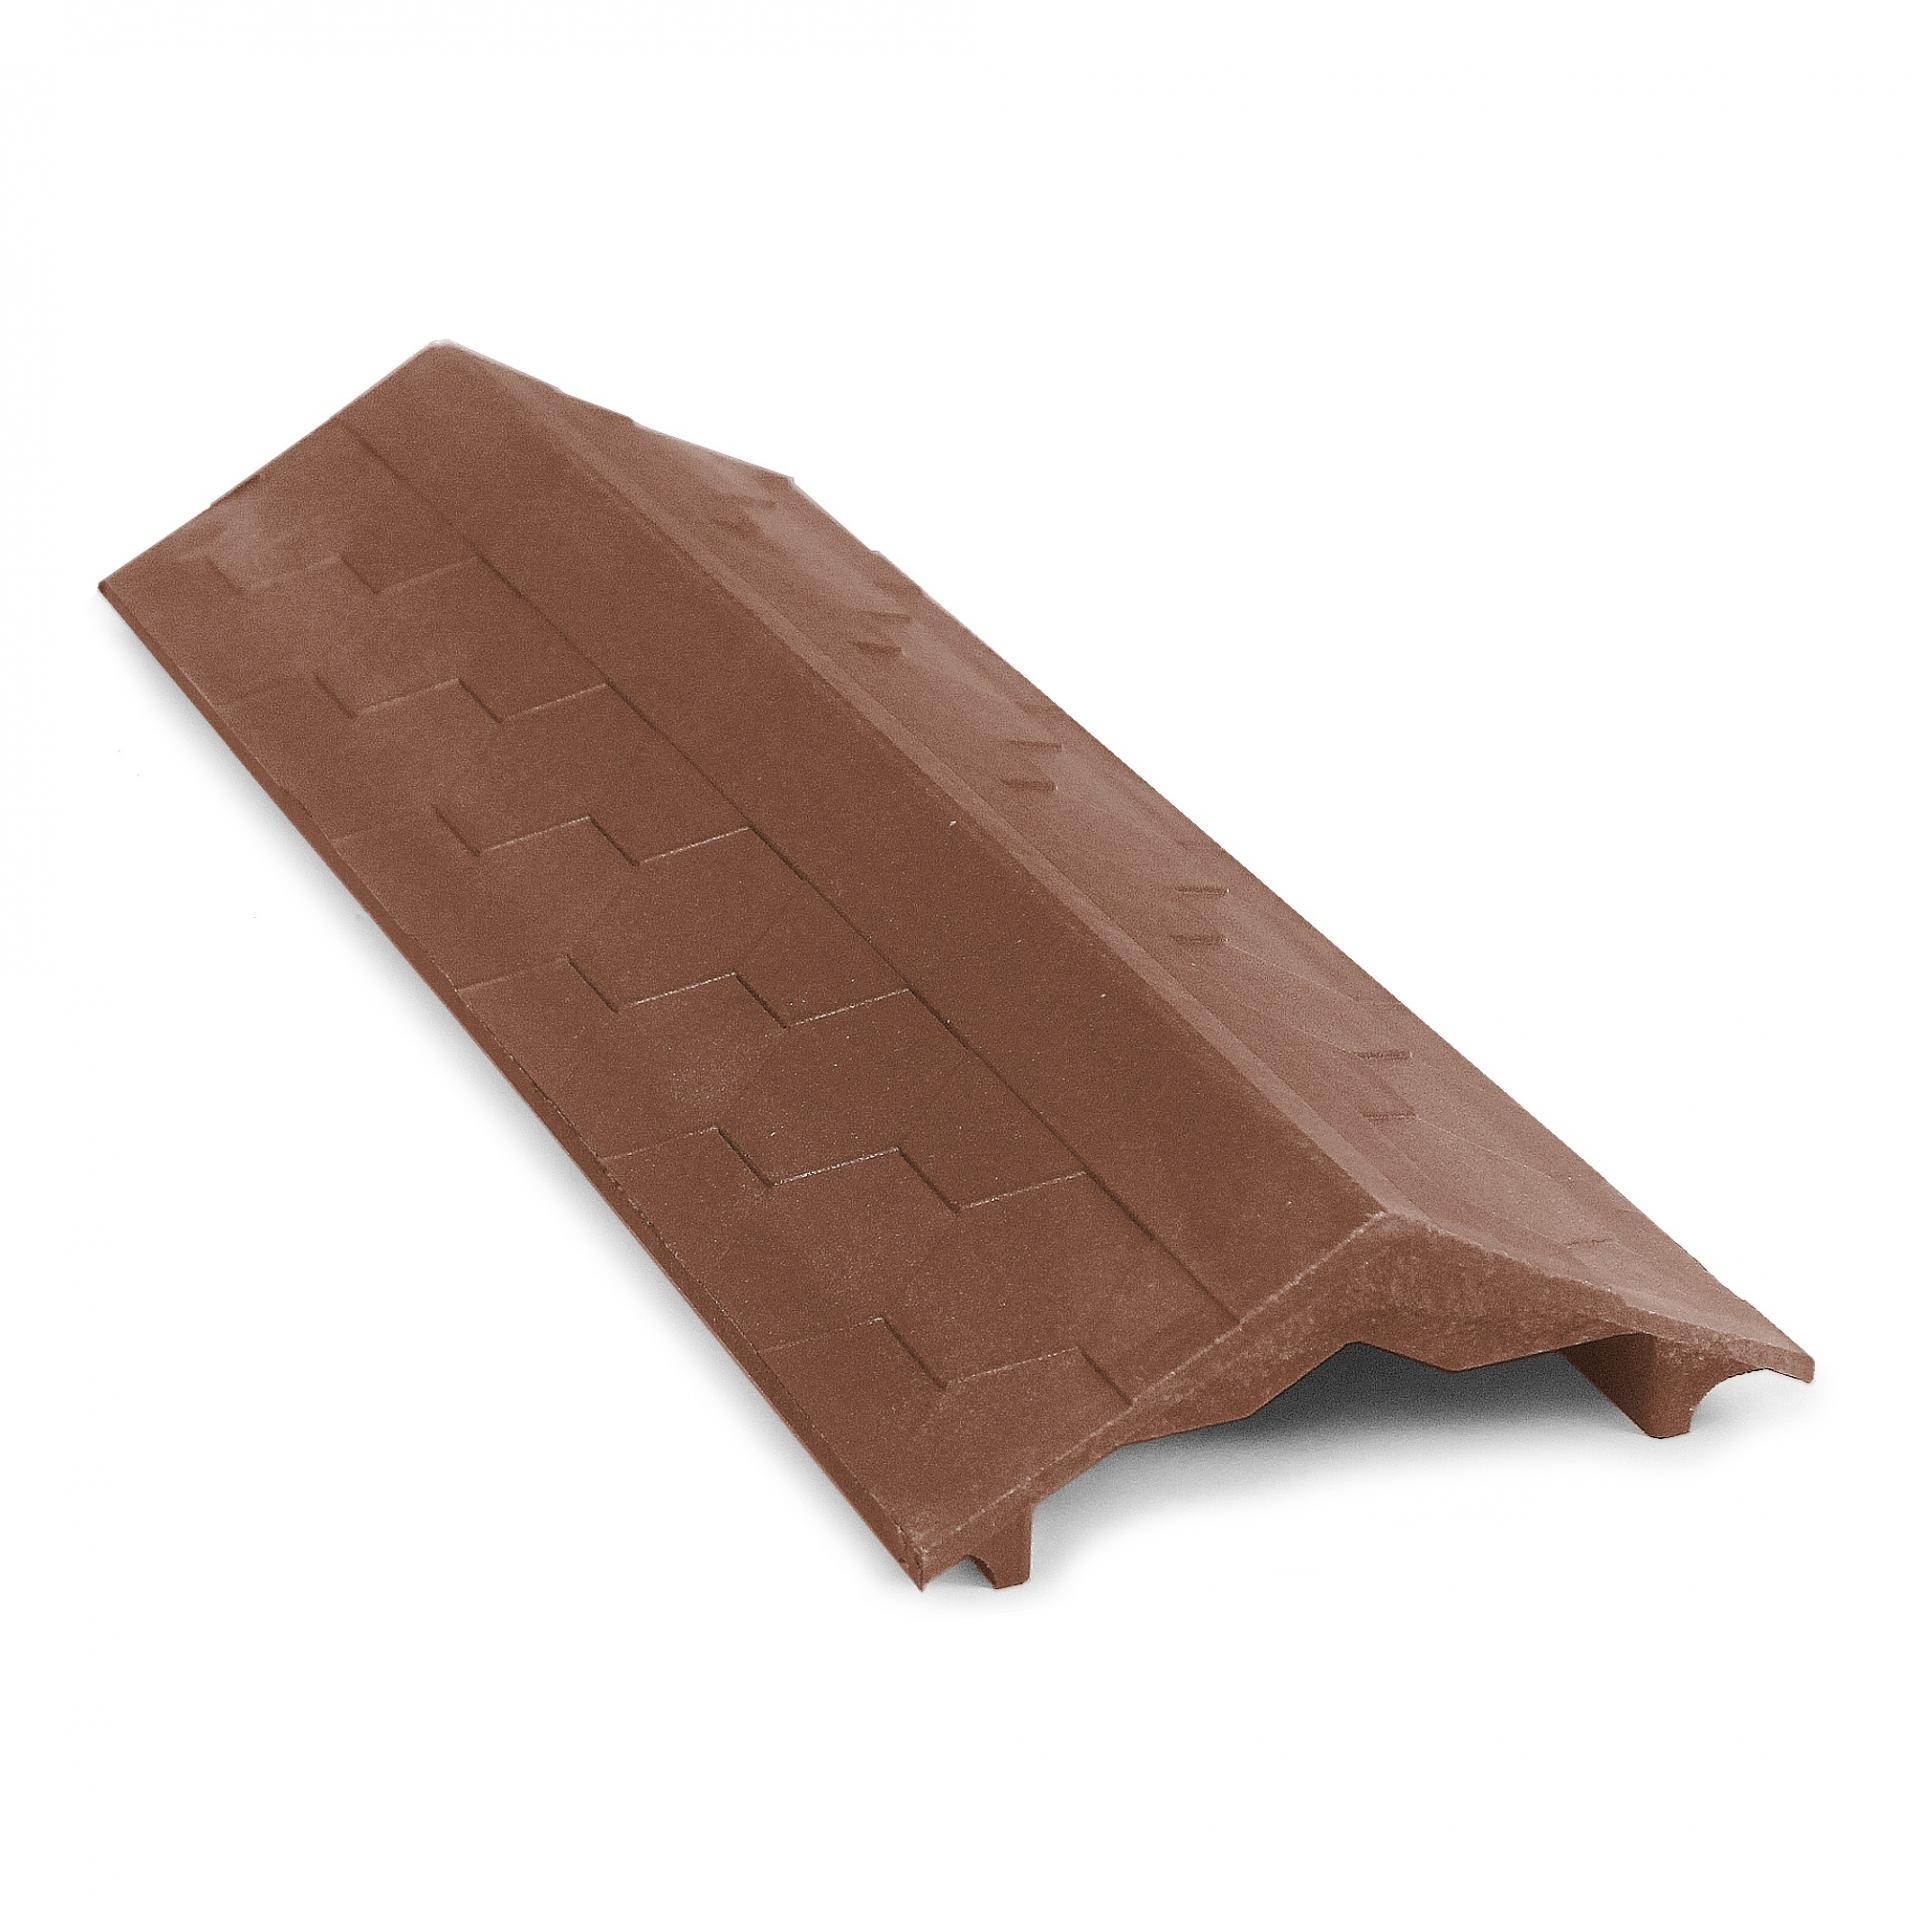 Парапет ППК на забор 500х125х25 коричневый